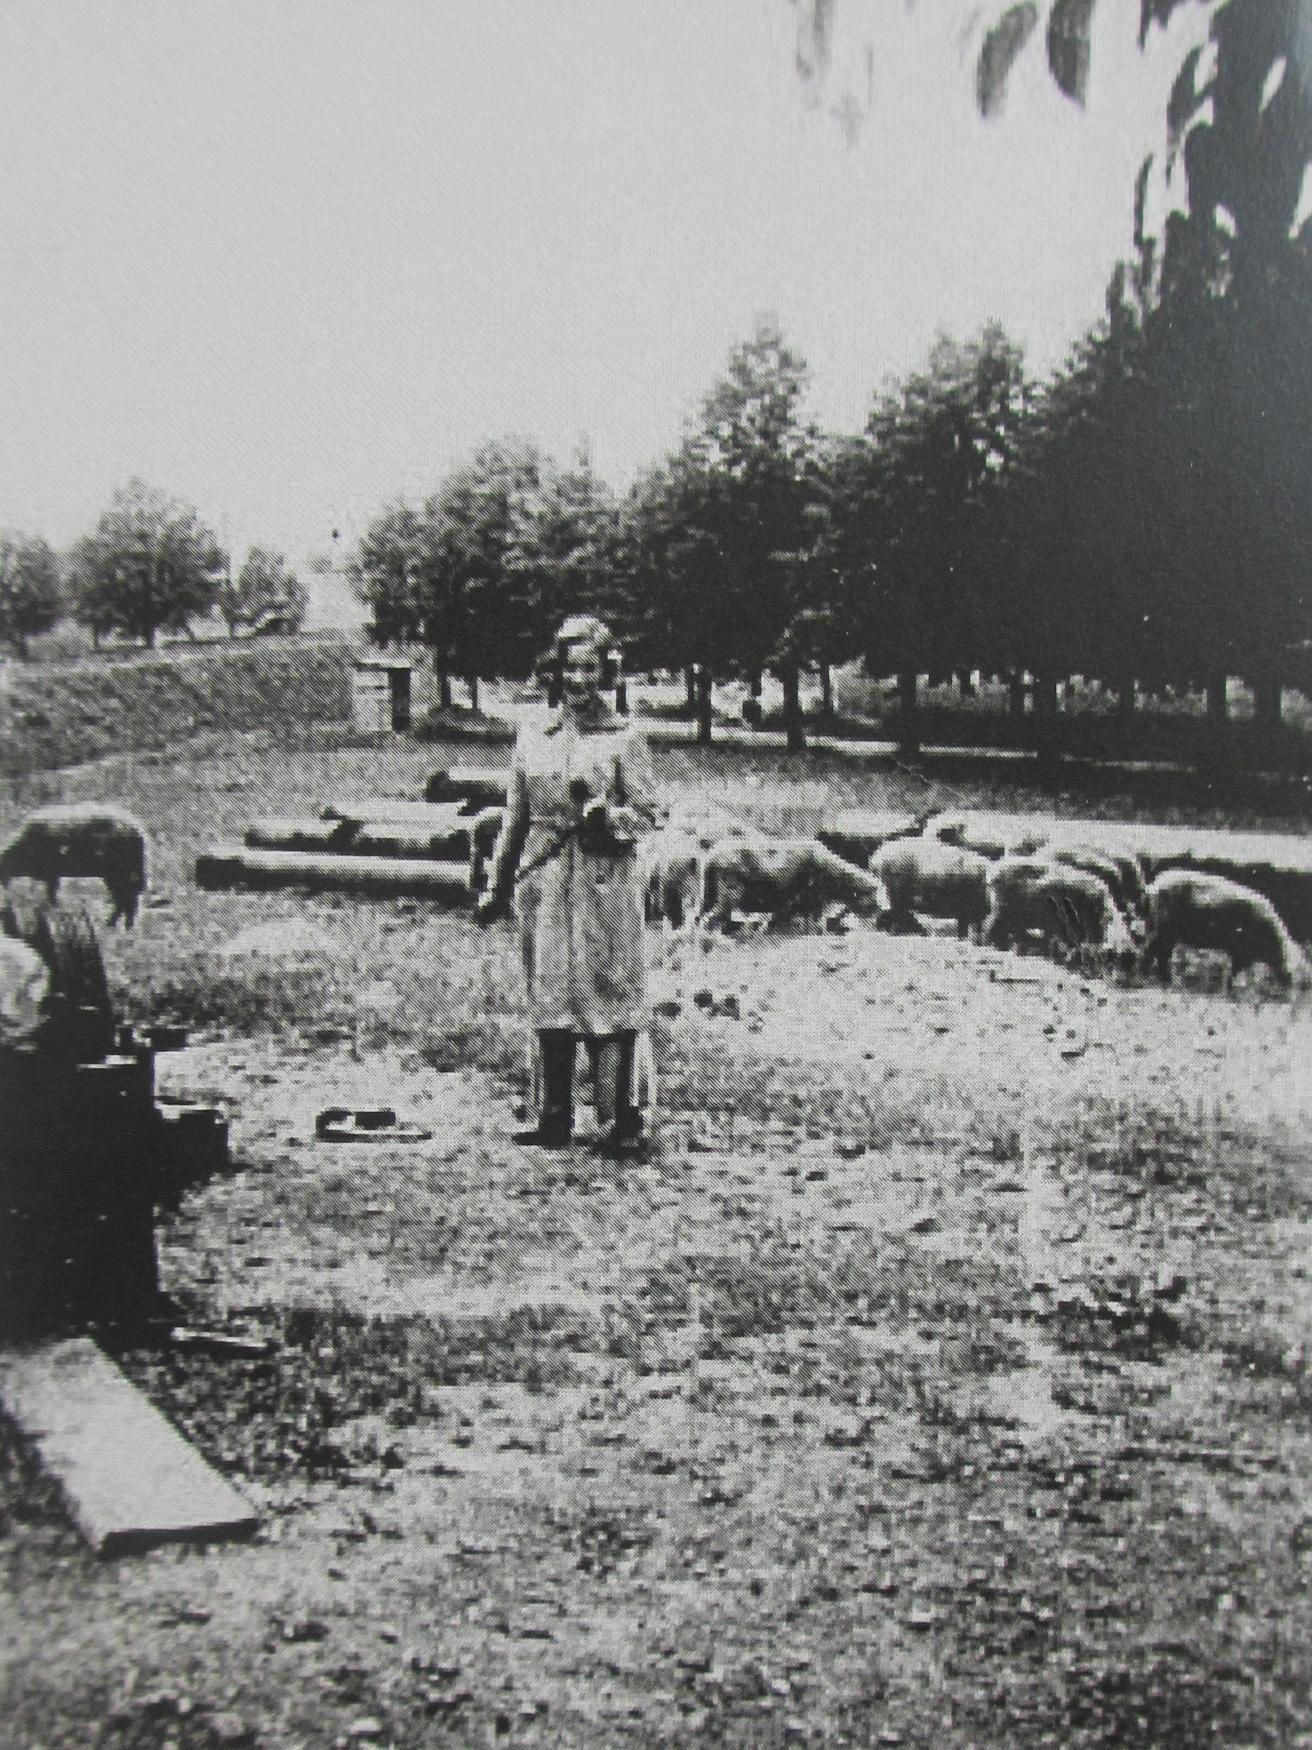 Doris Grozdanovičová: the girl with the sheep in Terezín | Radio Prague